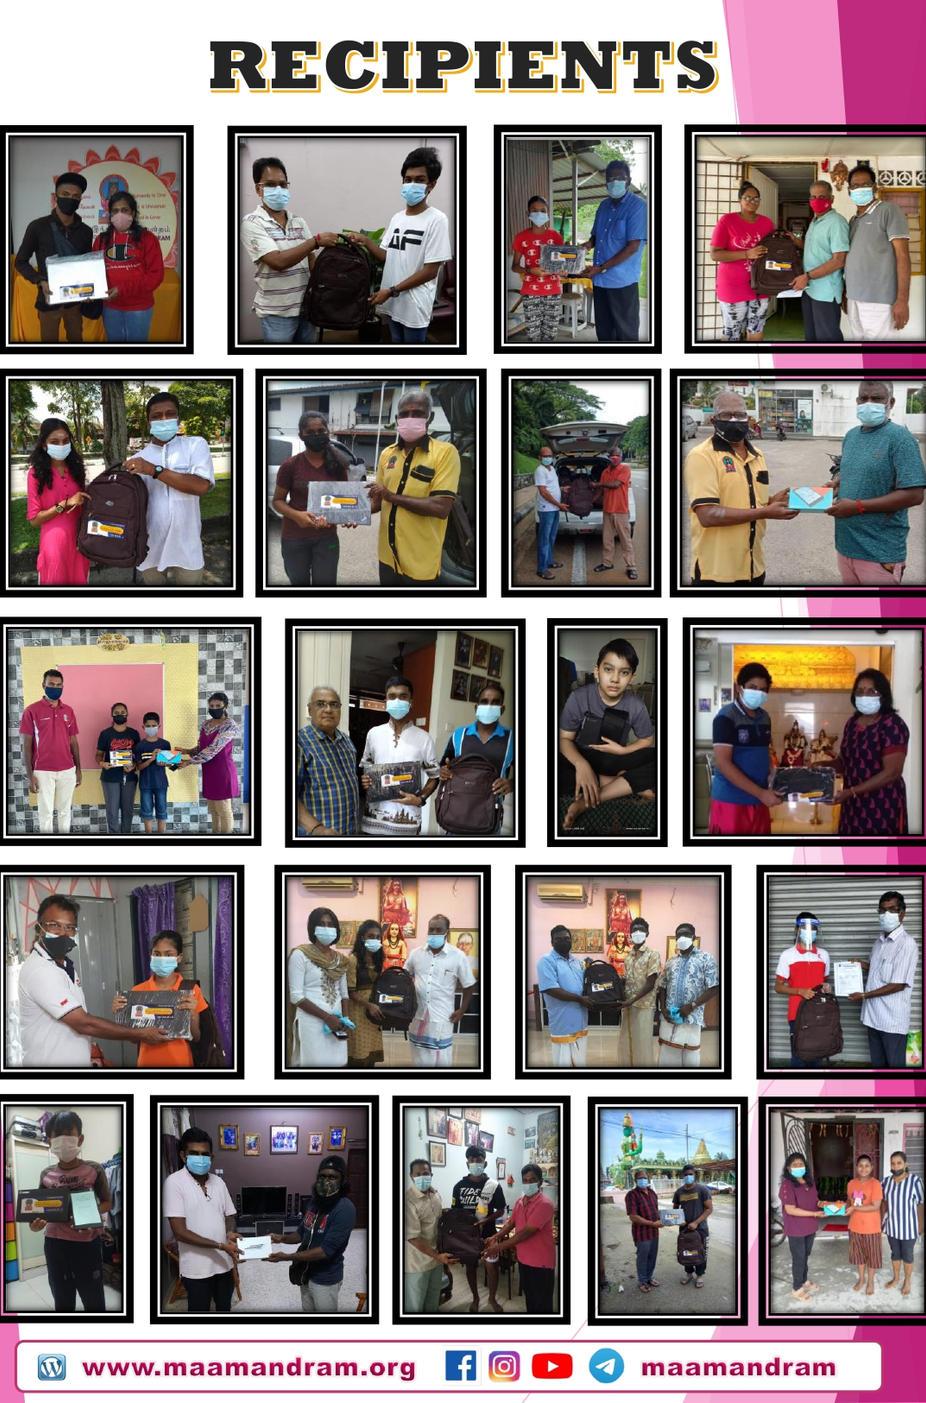 Dharma Welfare - Sub Com - A Student A Gadget - REPORT - Latest_page-0004.jpg